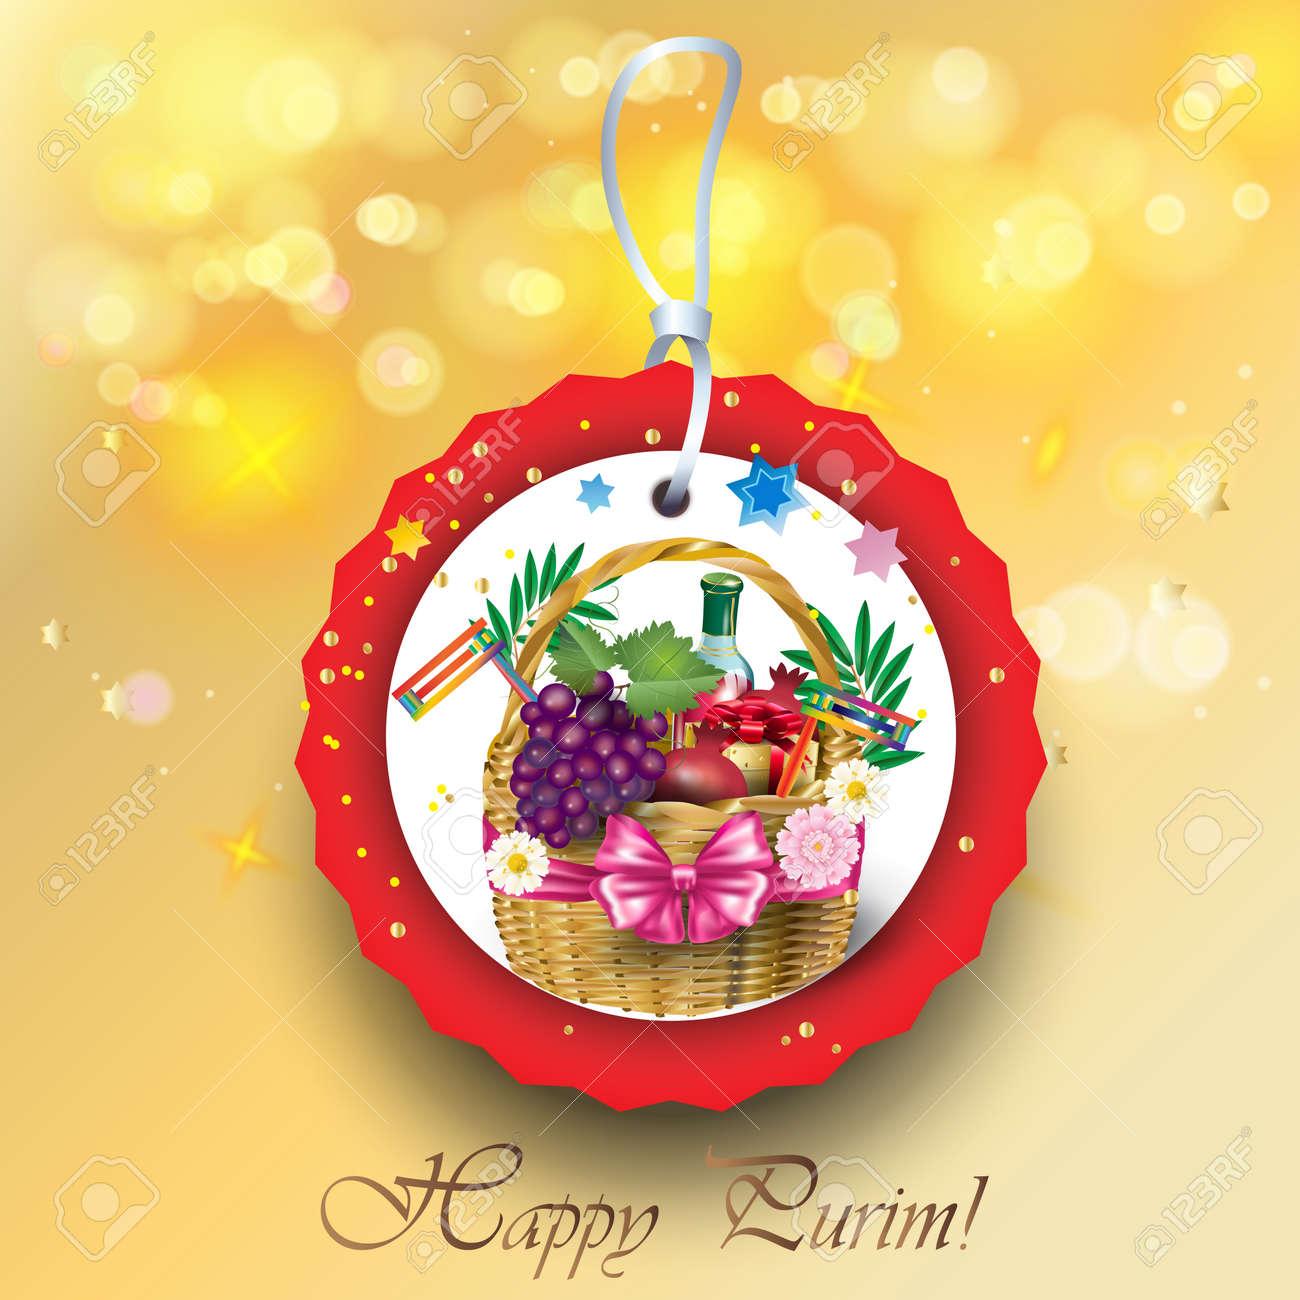 Happy purim jewish holiday greeting card with gift tag traditional happy purim jewish holiday greeting card with gift tag traditional symbols gift basket illustration m4hsunfo